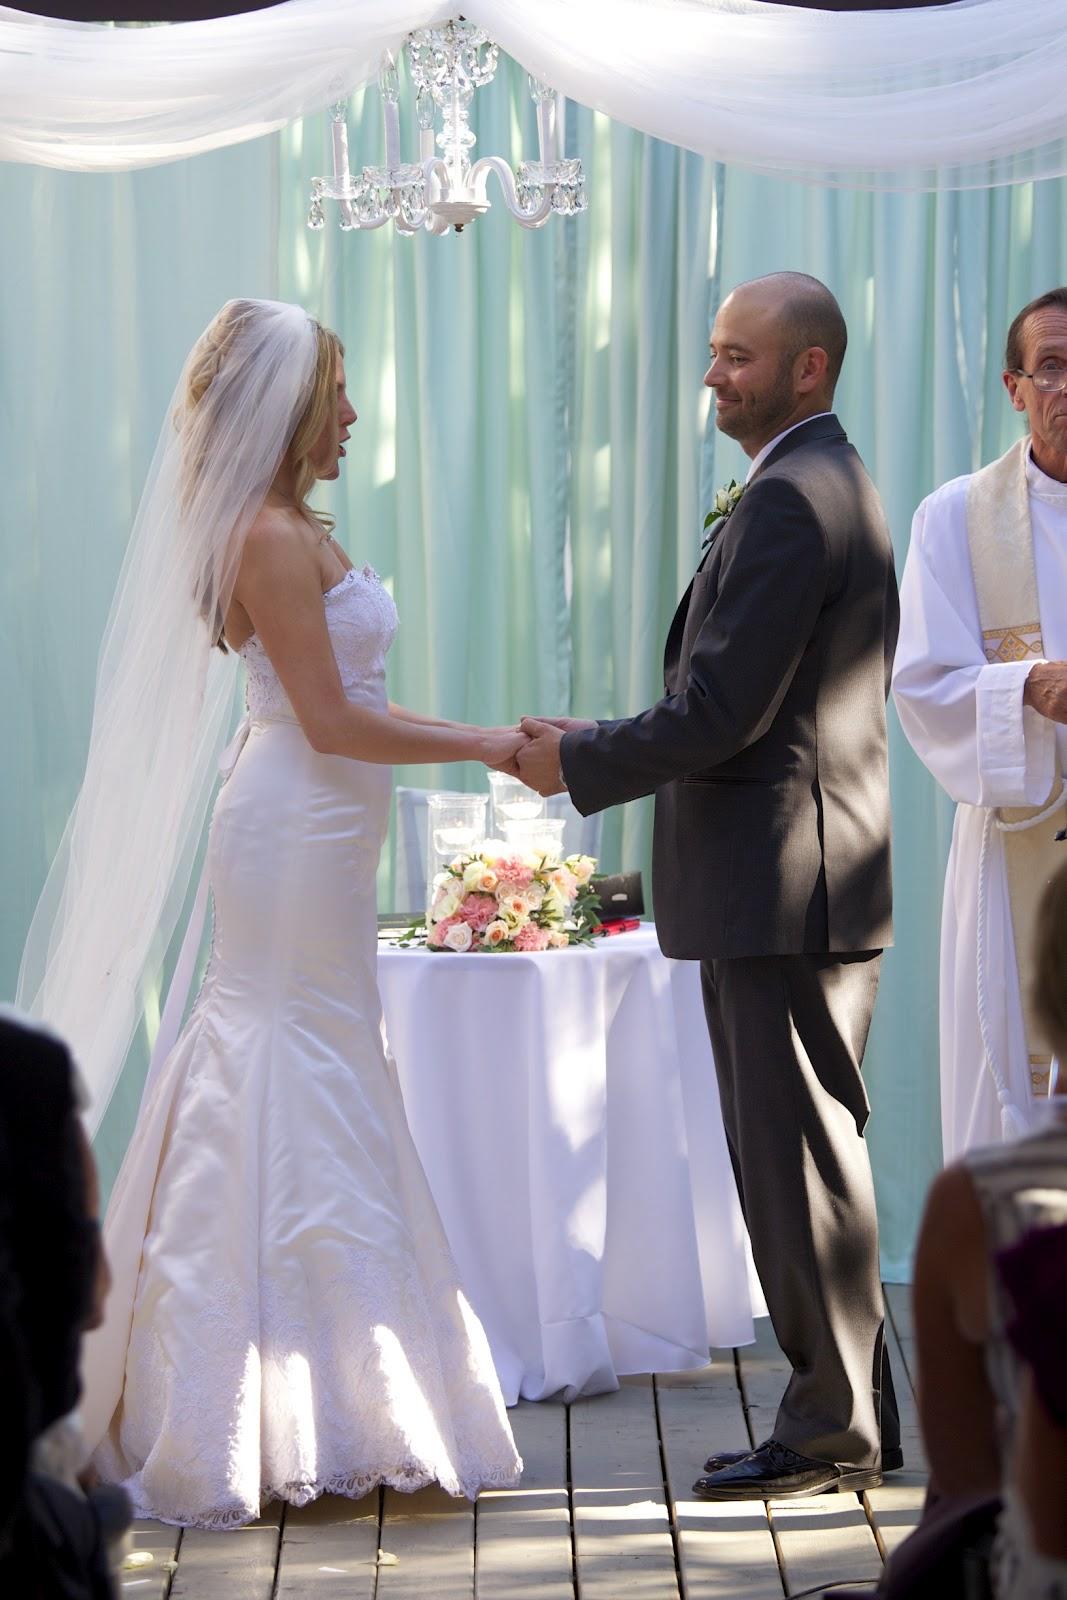 Diy Wedding Veil.Diy Wedding Veil Harlow Thistle Home Design Lifestyle Diy